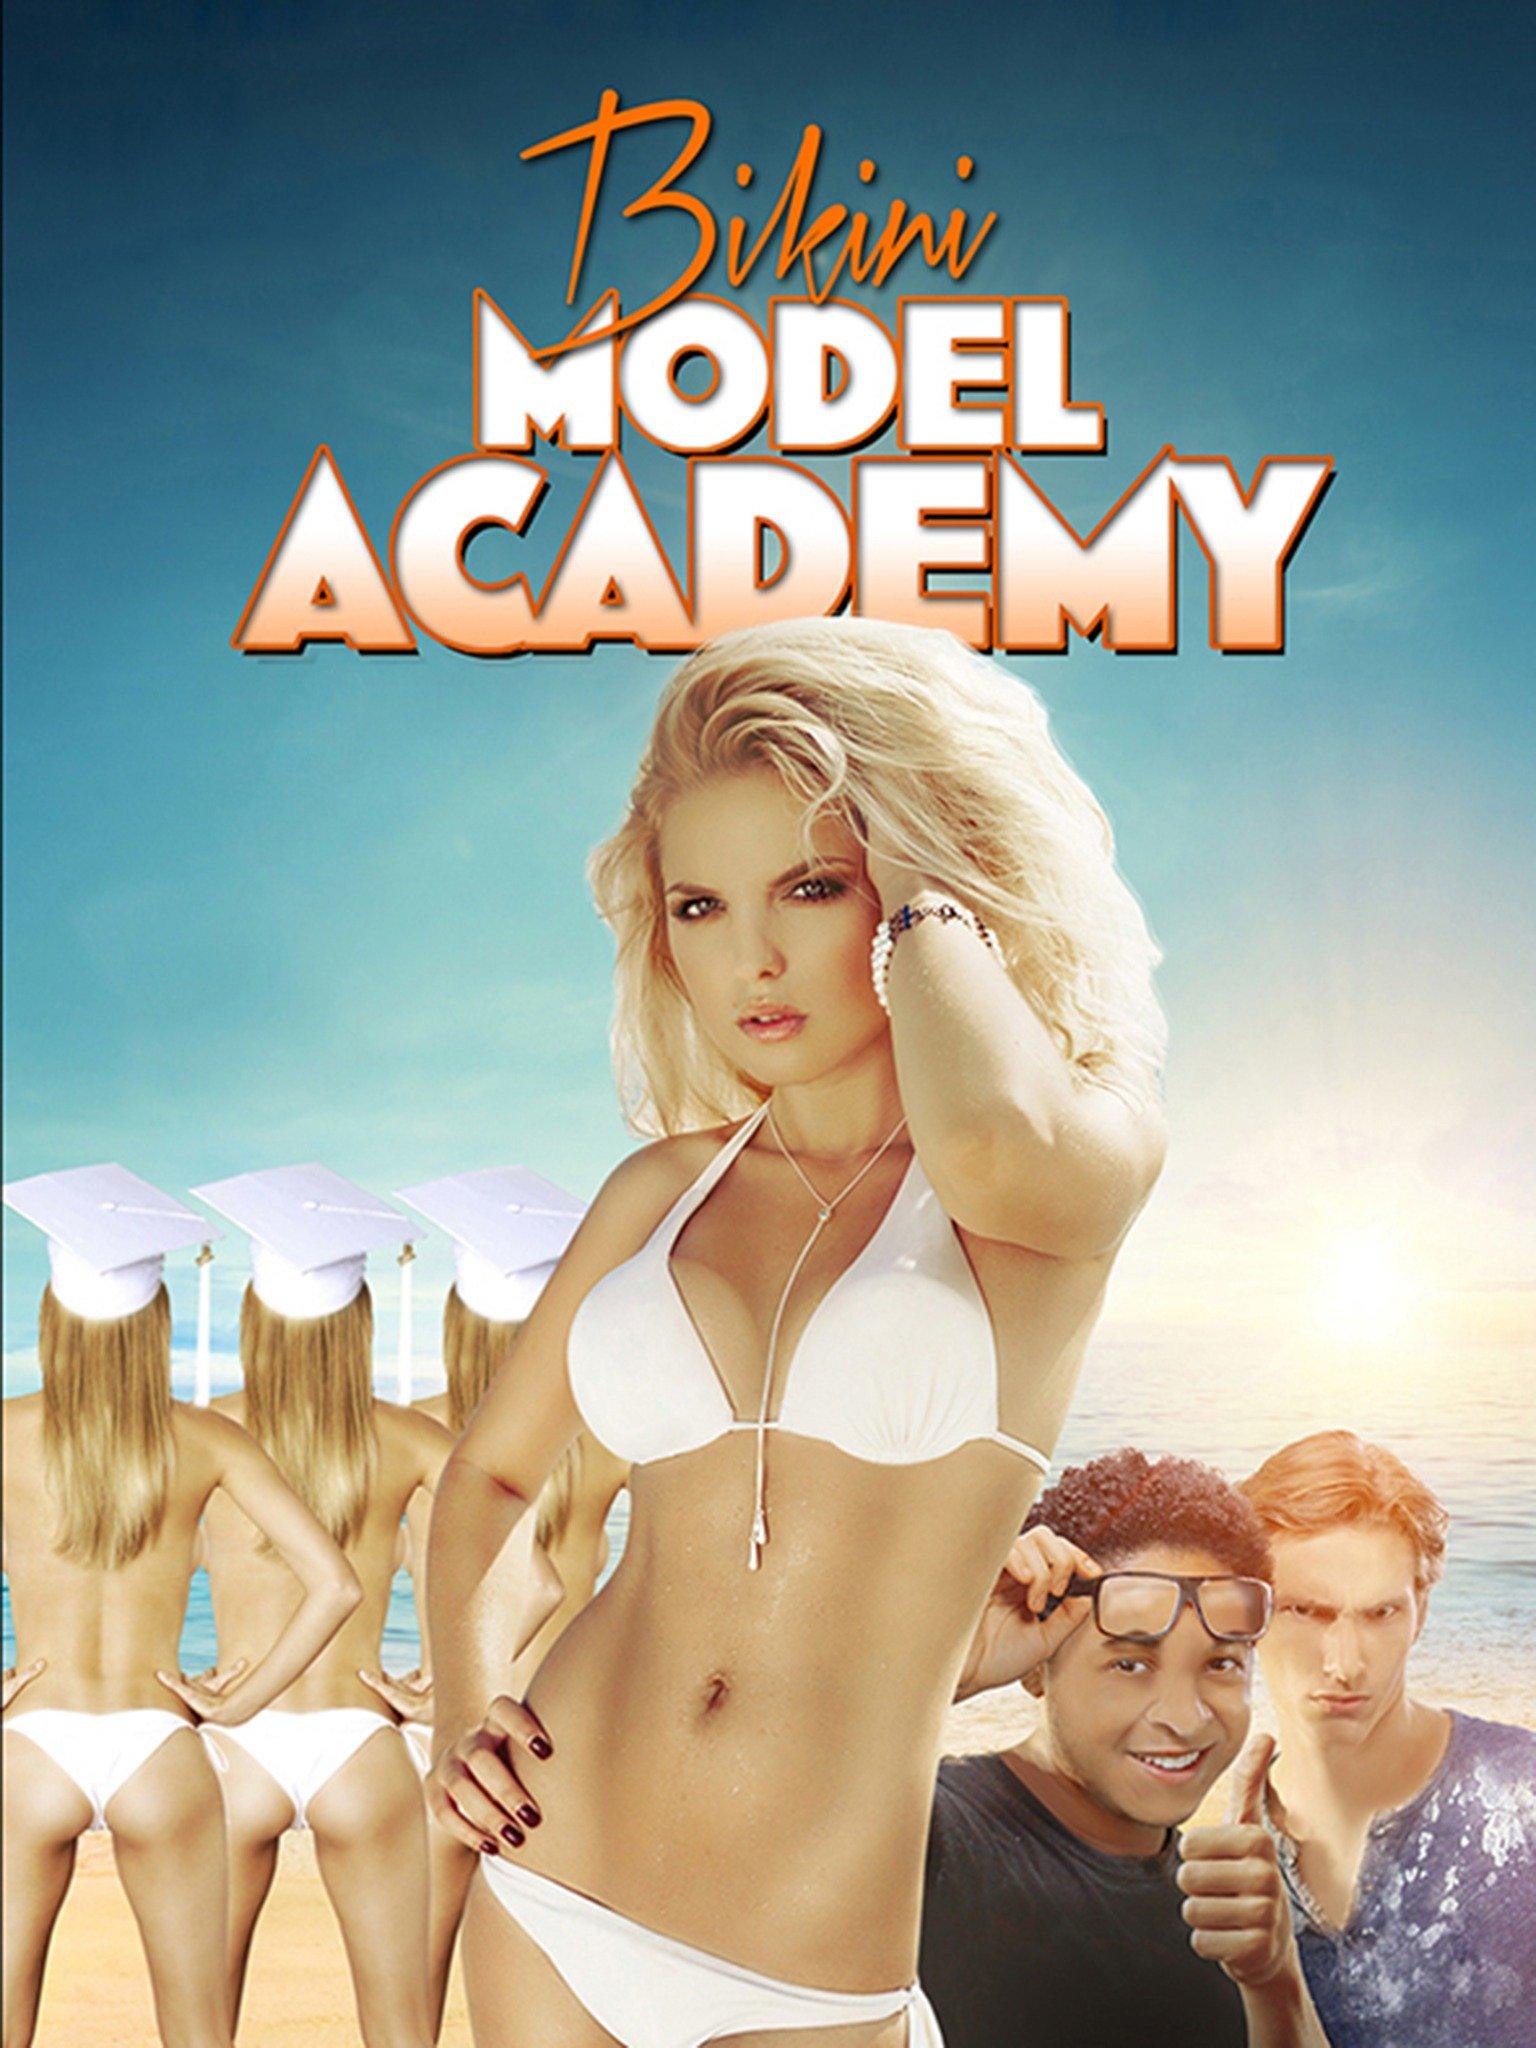 18+ Bikini Model Academy 2021 English Hot Movie 720p UNCUT BluRay 700MB x264 AAC Download